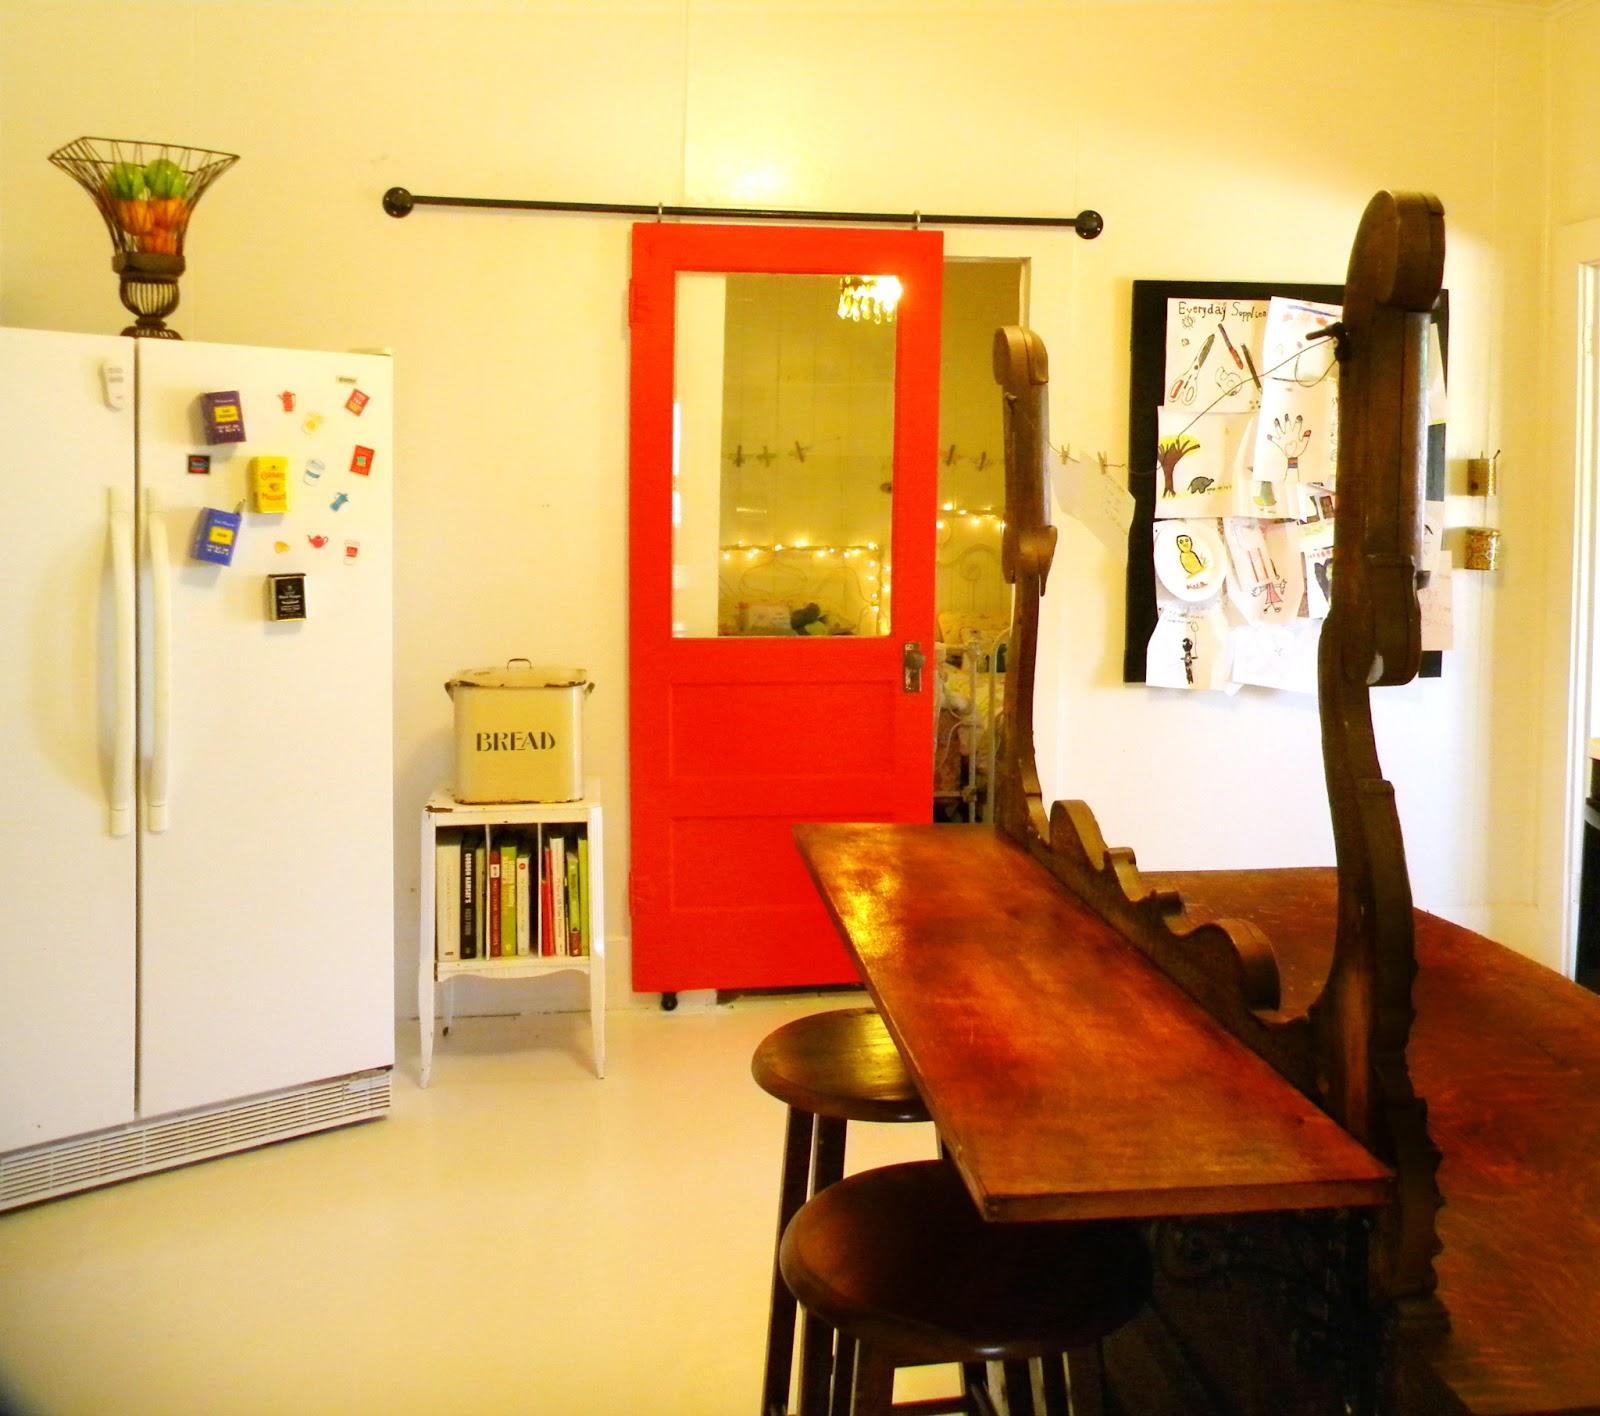 Building Sliding Barn Door Diy: Fig Milkshakes: DIY Sliding Barn Door